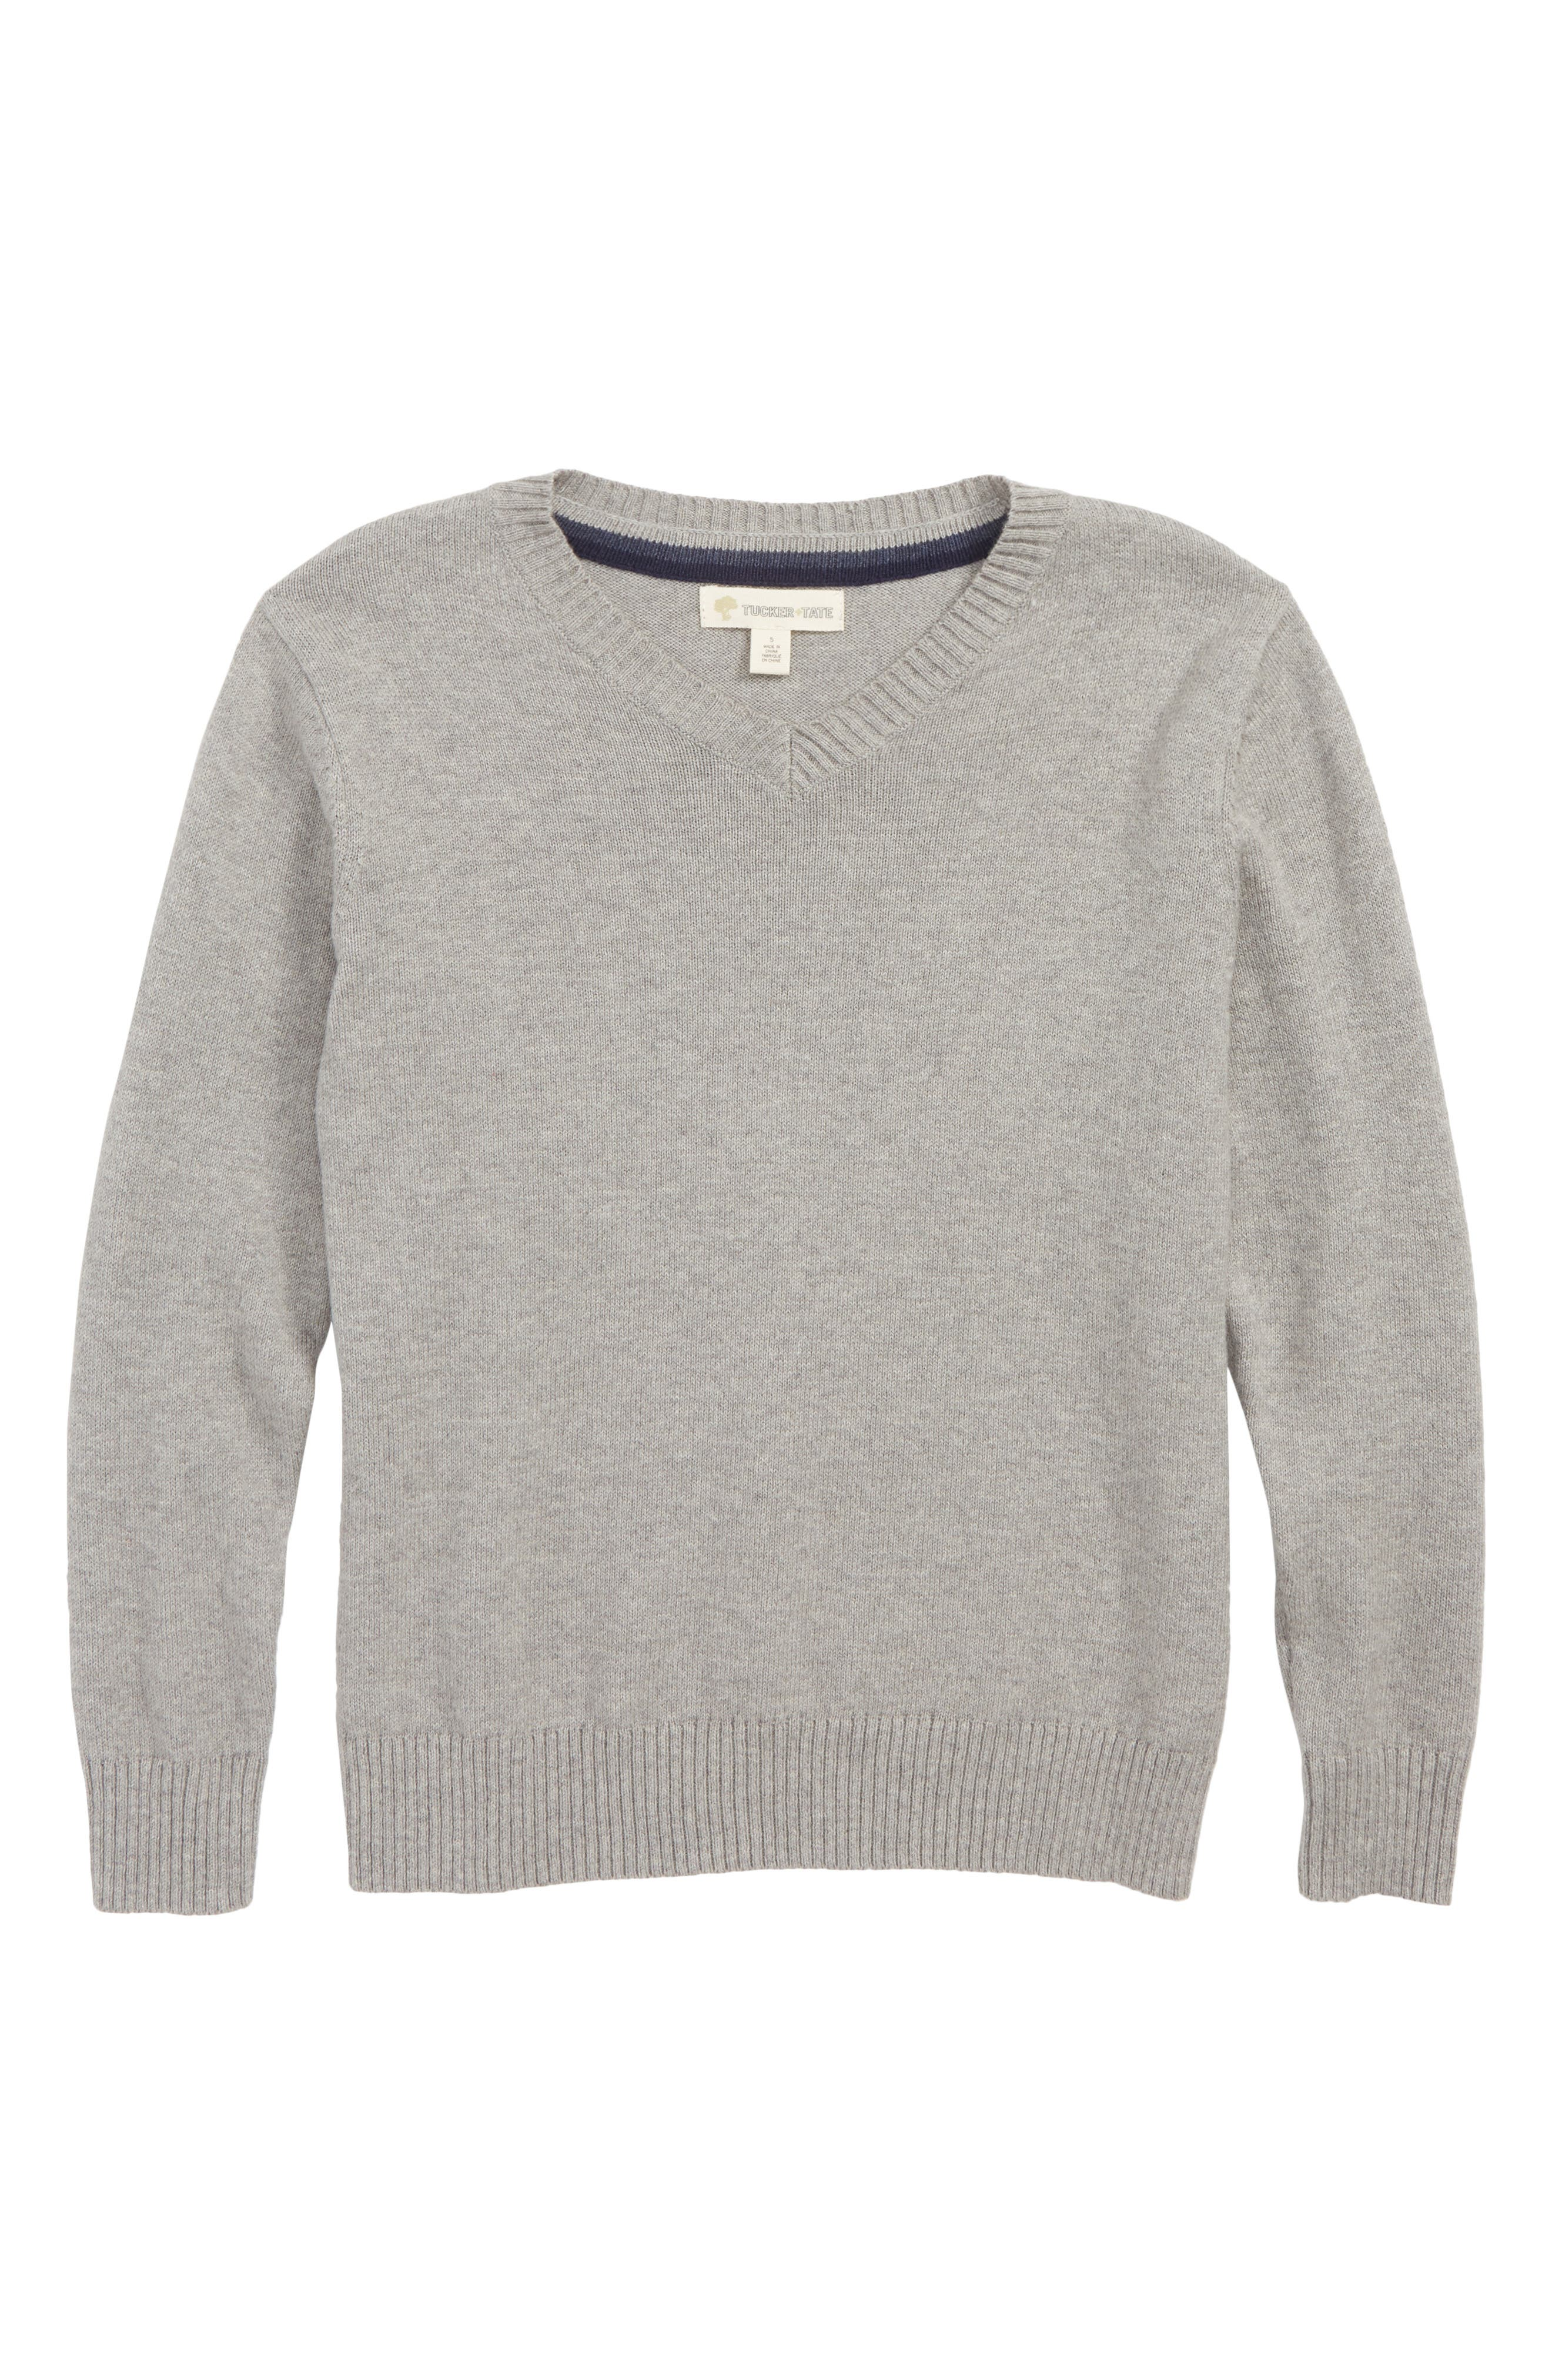 V-Neck Sweater,                         Main,                         color, GREY MEDIUM HEATHER